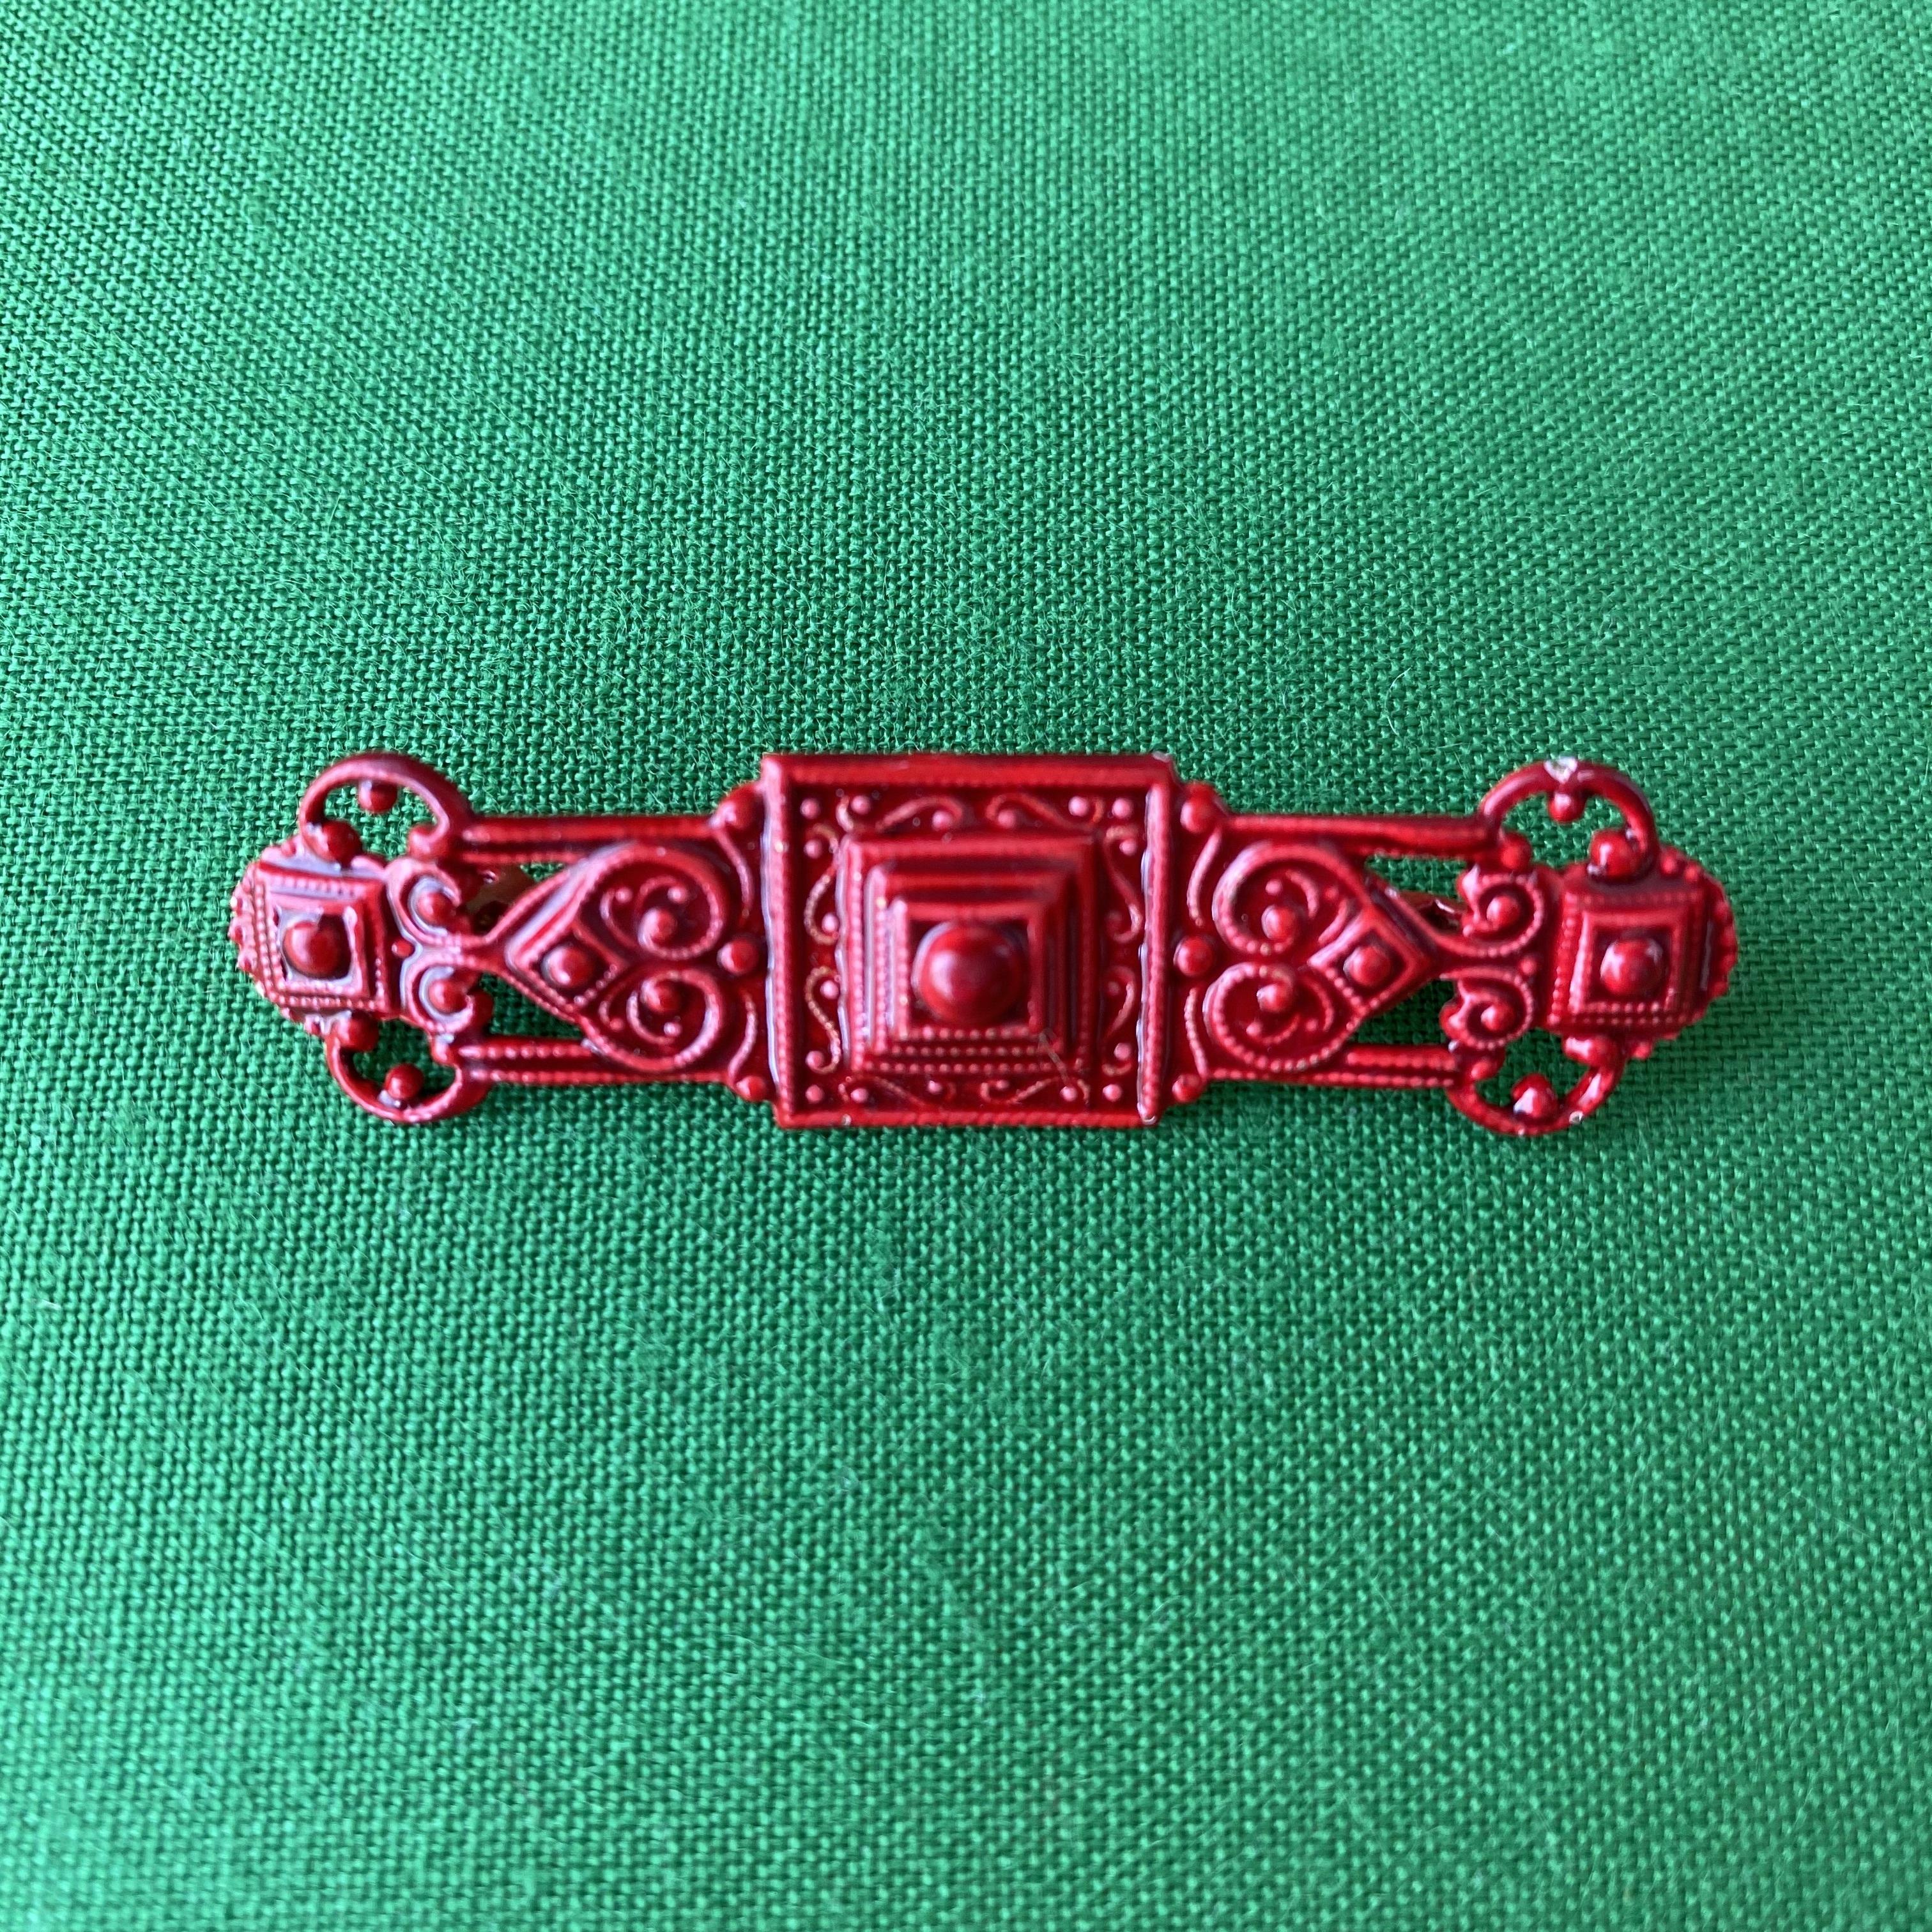 France エナメル・バーブローチ(red) /ac0044